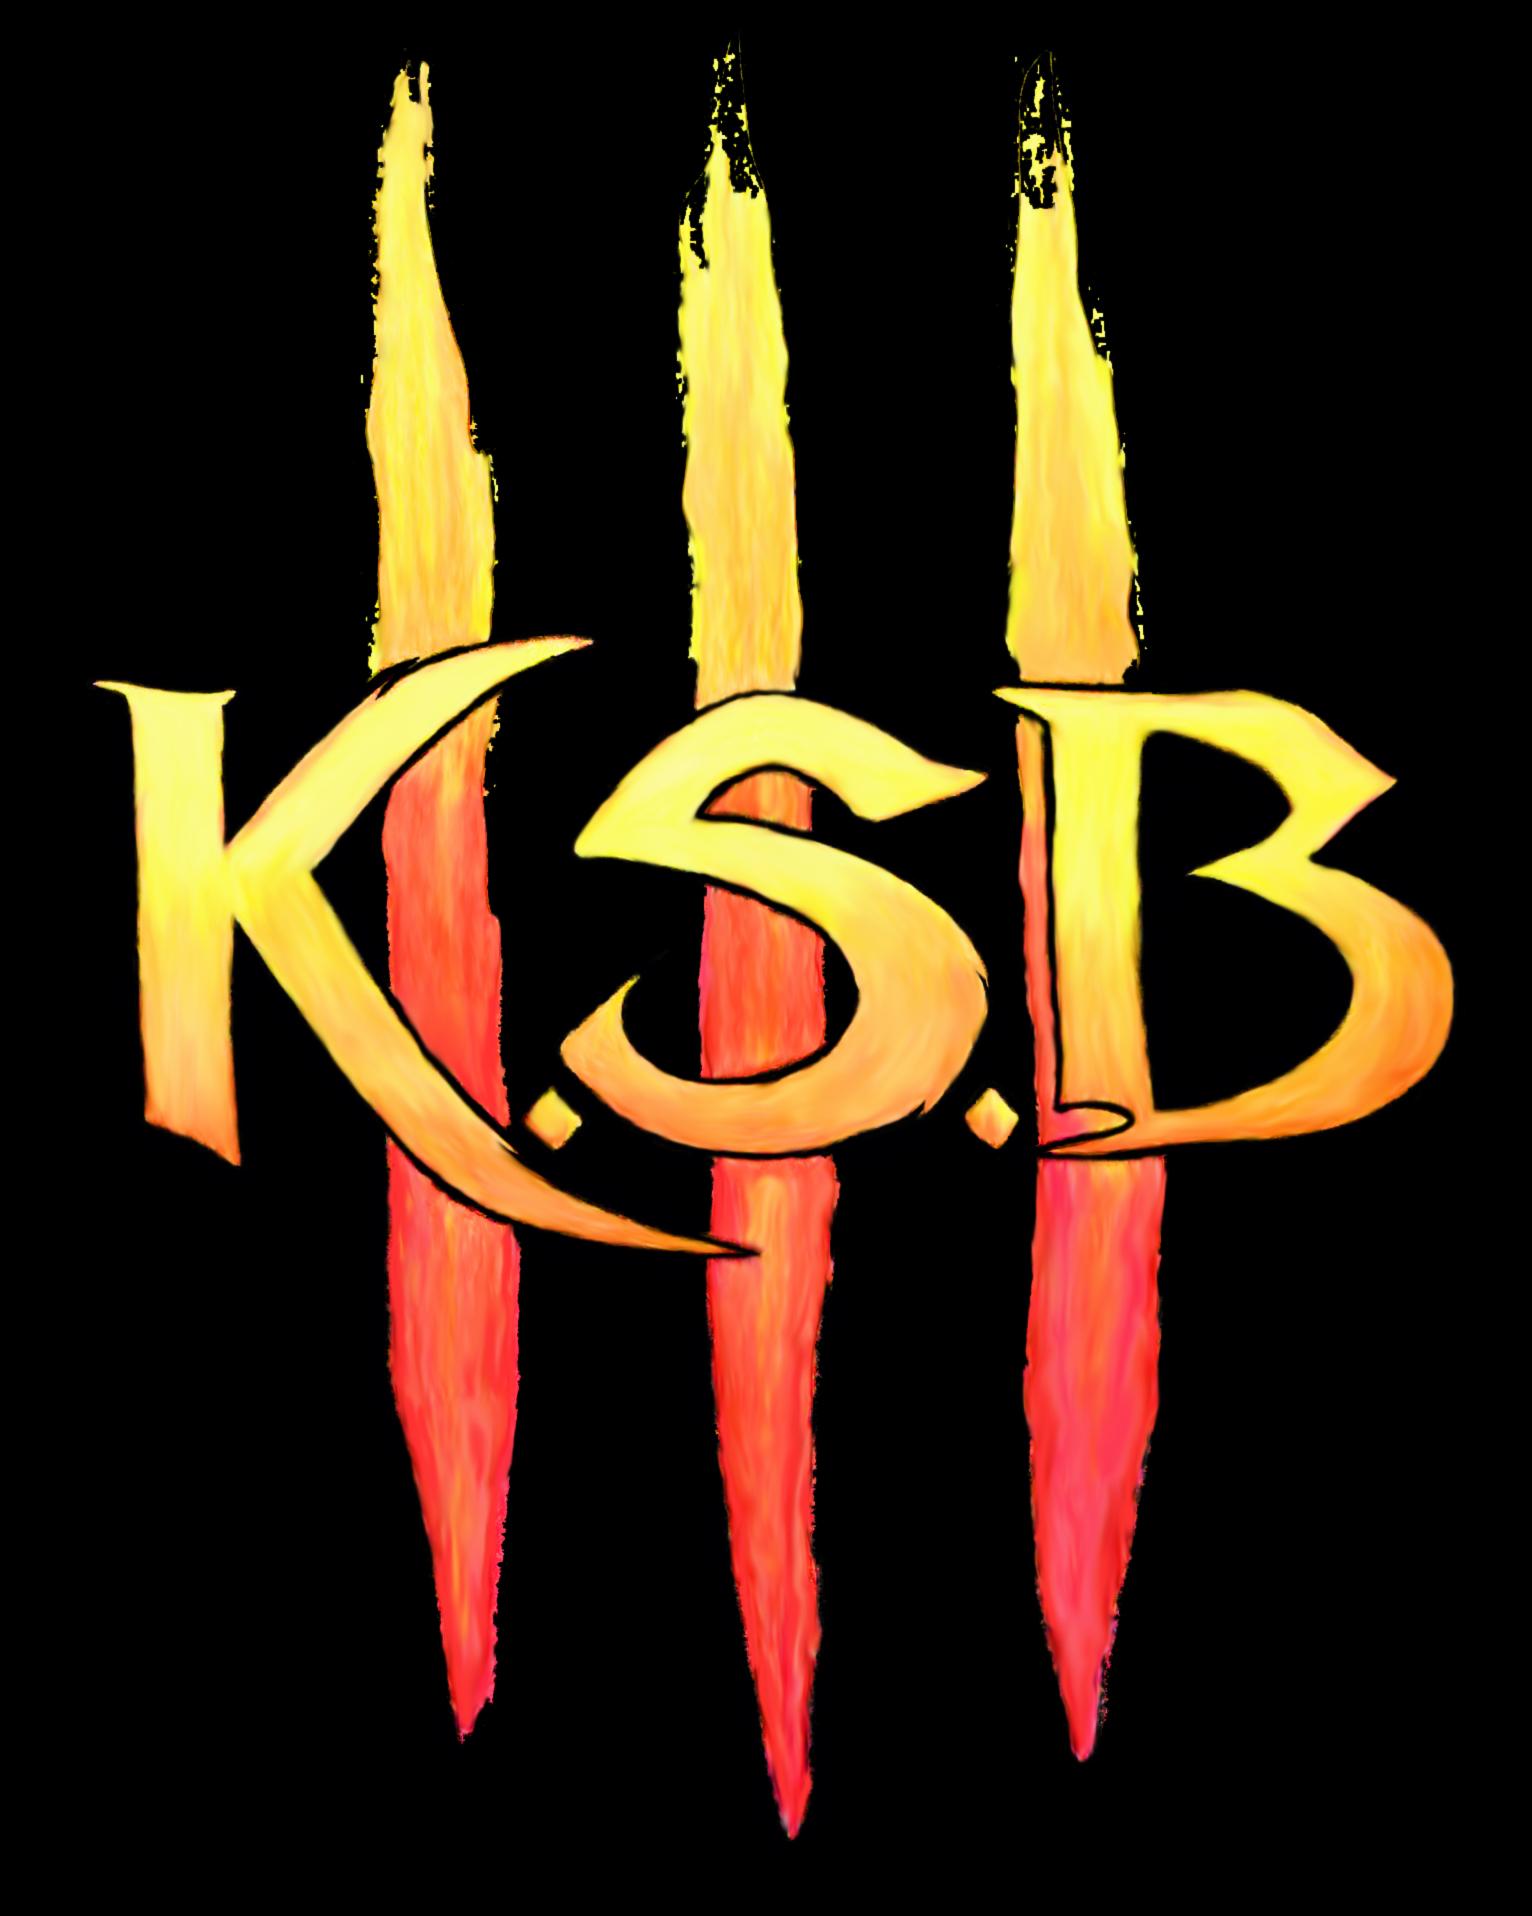 Kulle Story Bro - A Diablo 3 Podcast show art